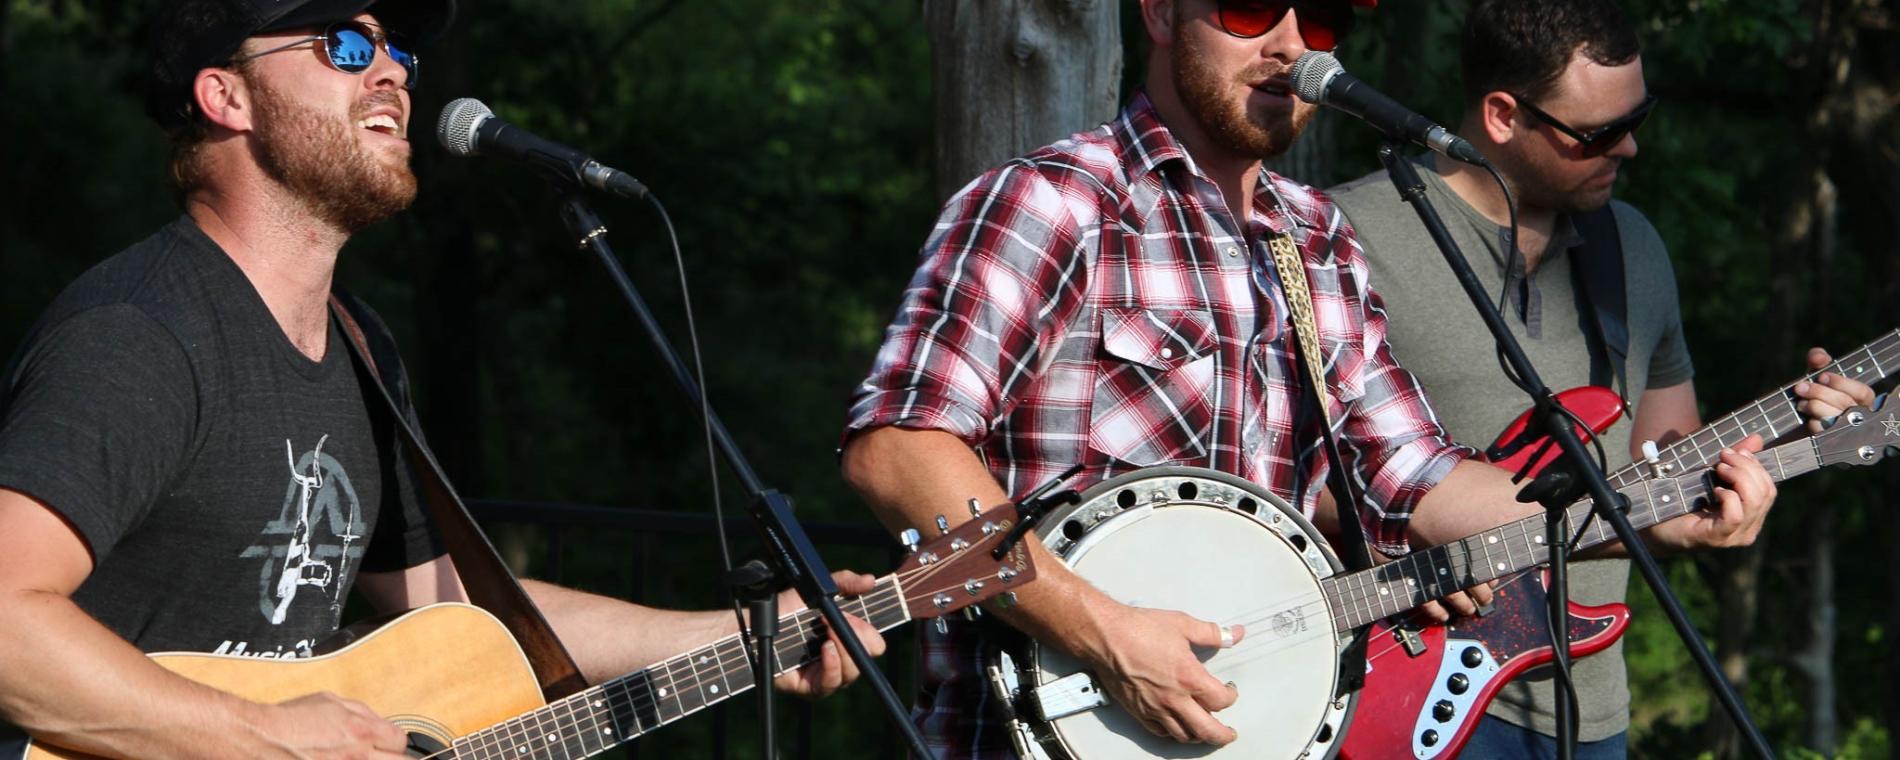 Bash band & banjo Visit Wichita